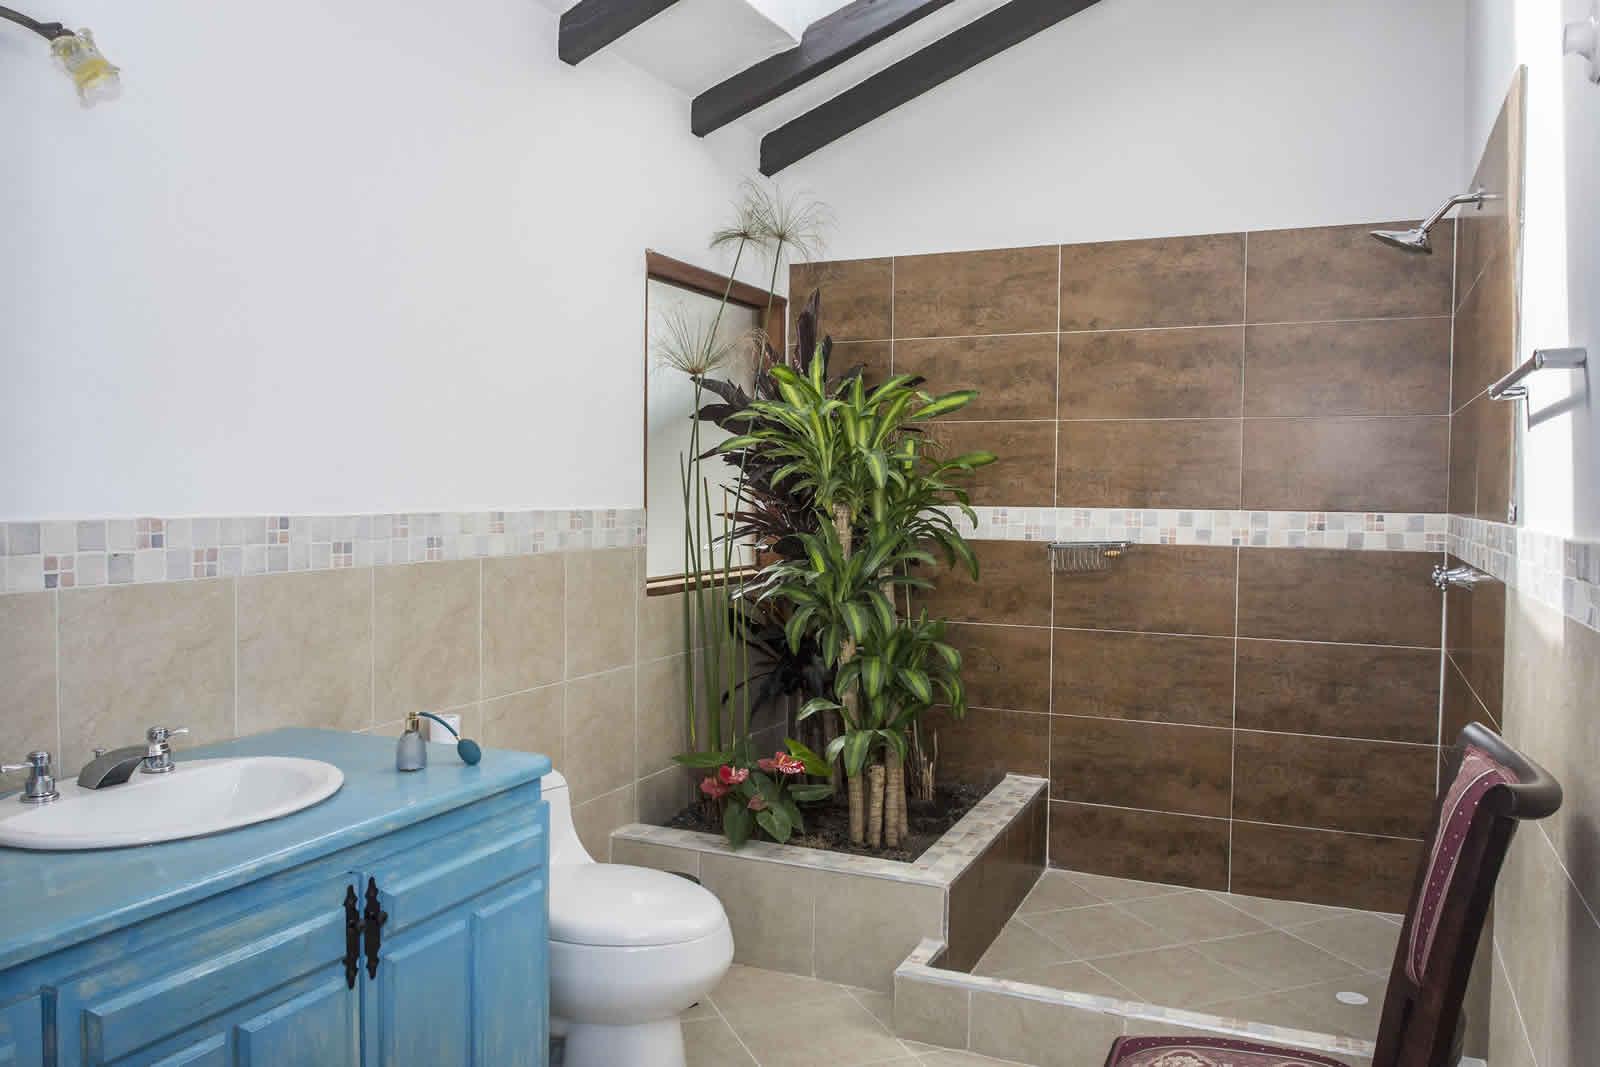 Alquiler Casa Azul en Villa de Leyva baño habitación principal